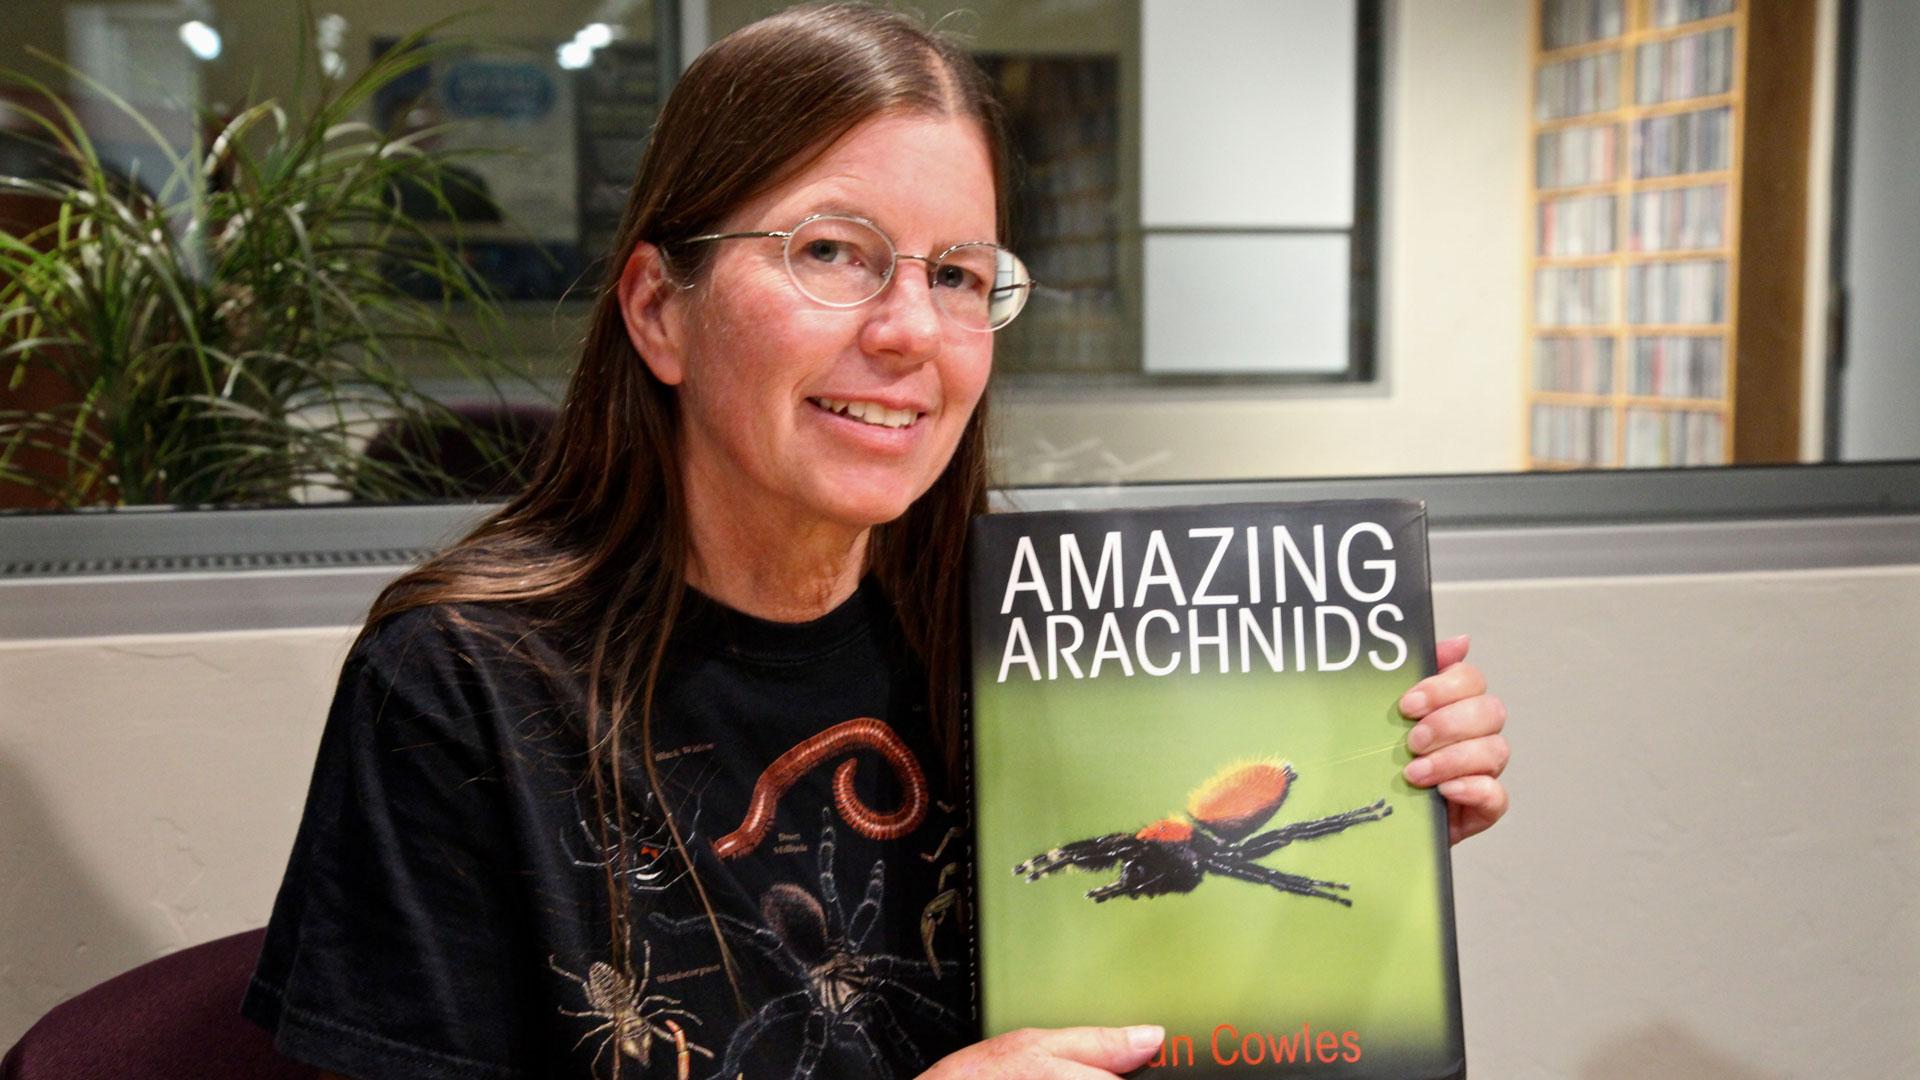 Jillian Cowles with book hero